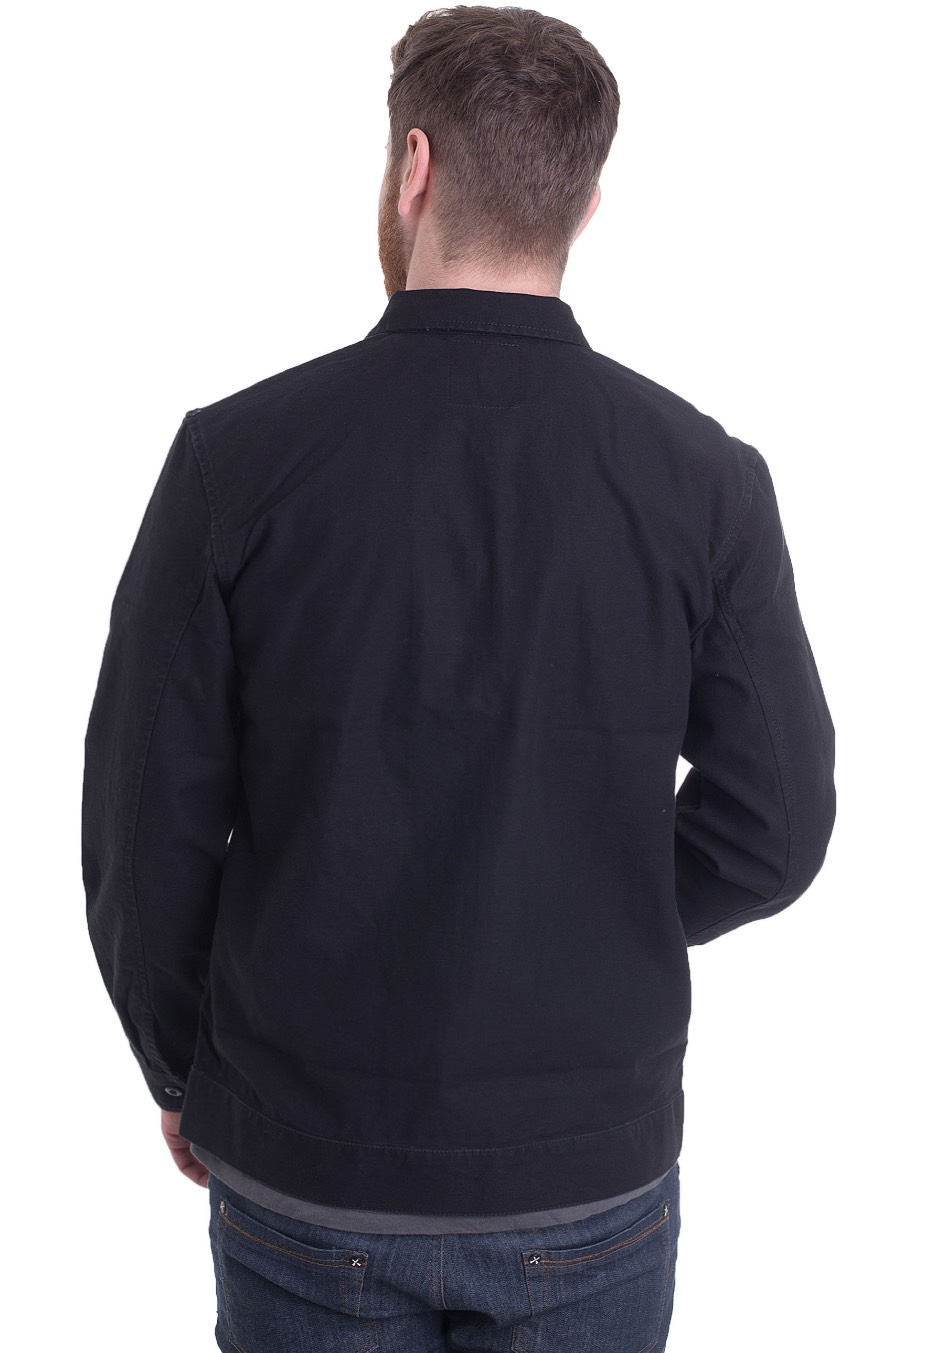 Dickies Black Barnesville Jacket Black Jacket Jacket Dickies Dickies Barnesville Barnesville Barnesville Dickies Black qgPOzz